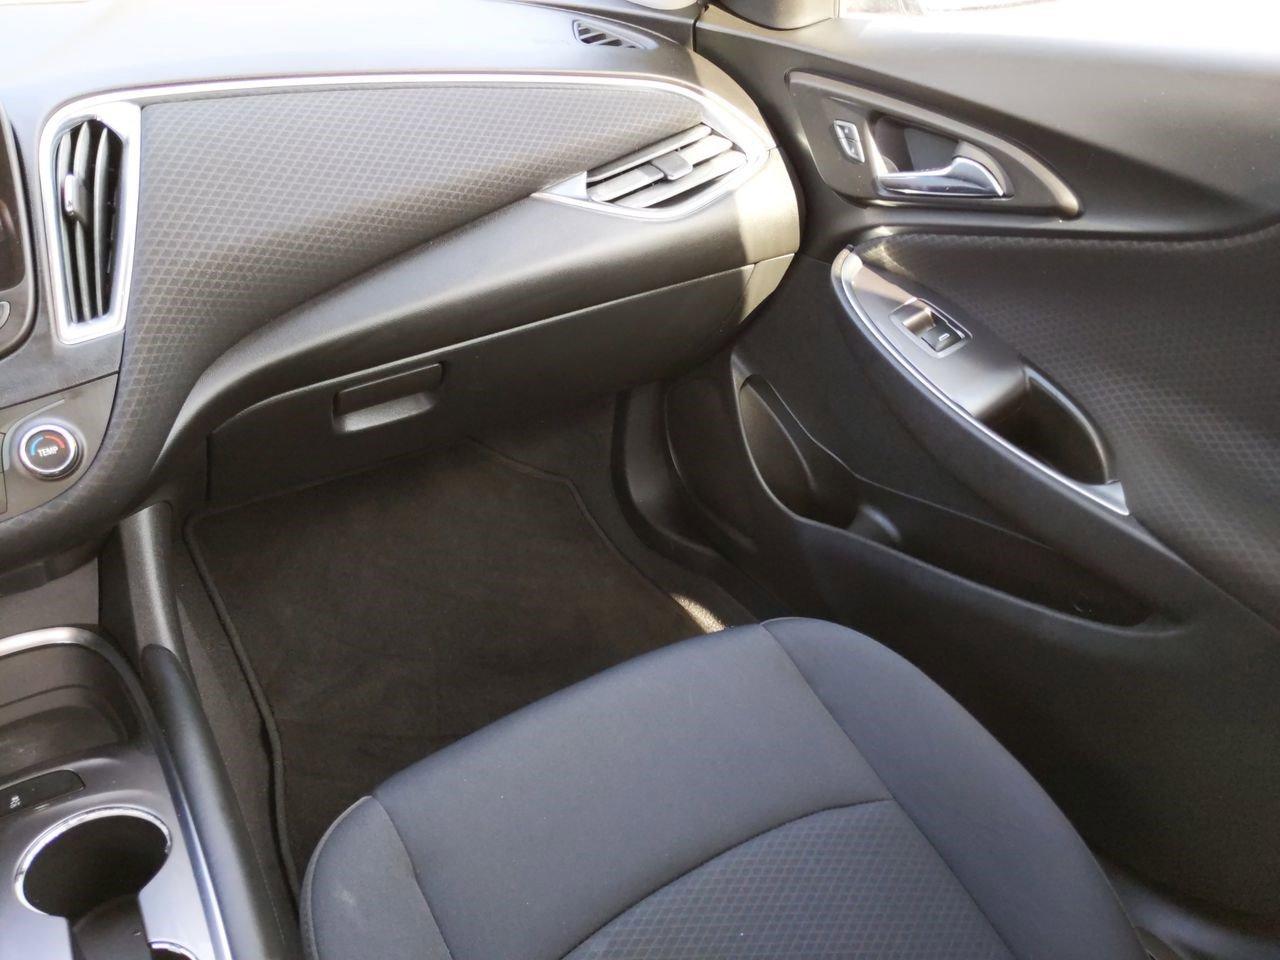 Certified Pre-Owned 2017 Chevrolet Malibu LT